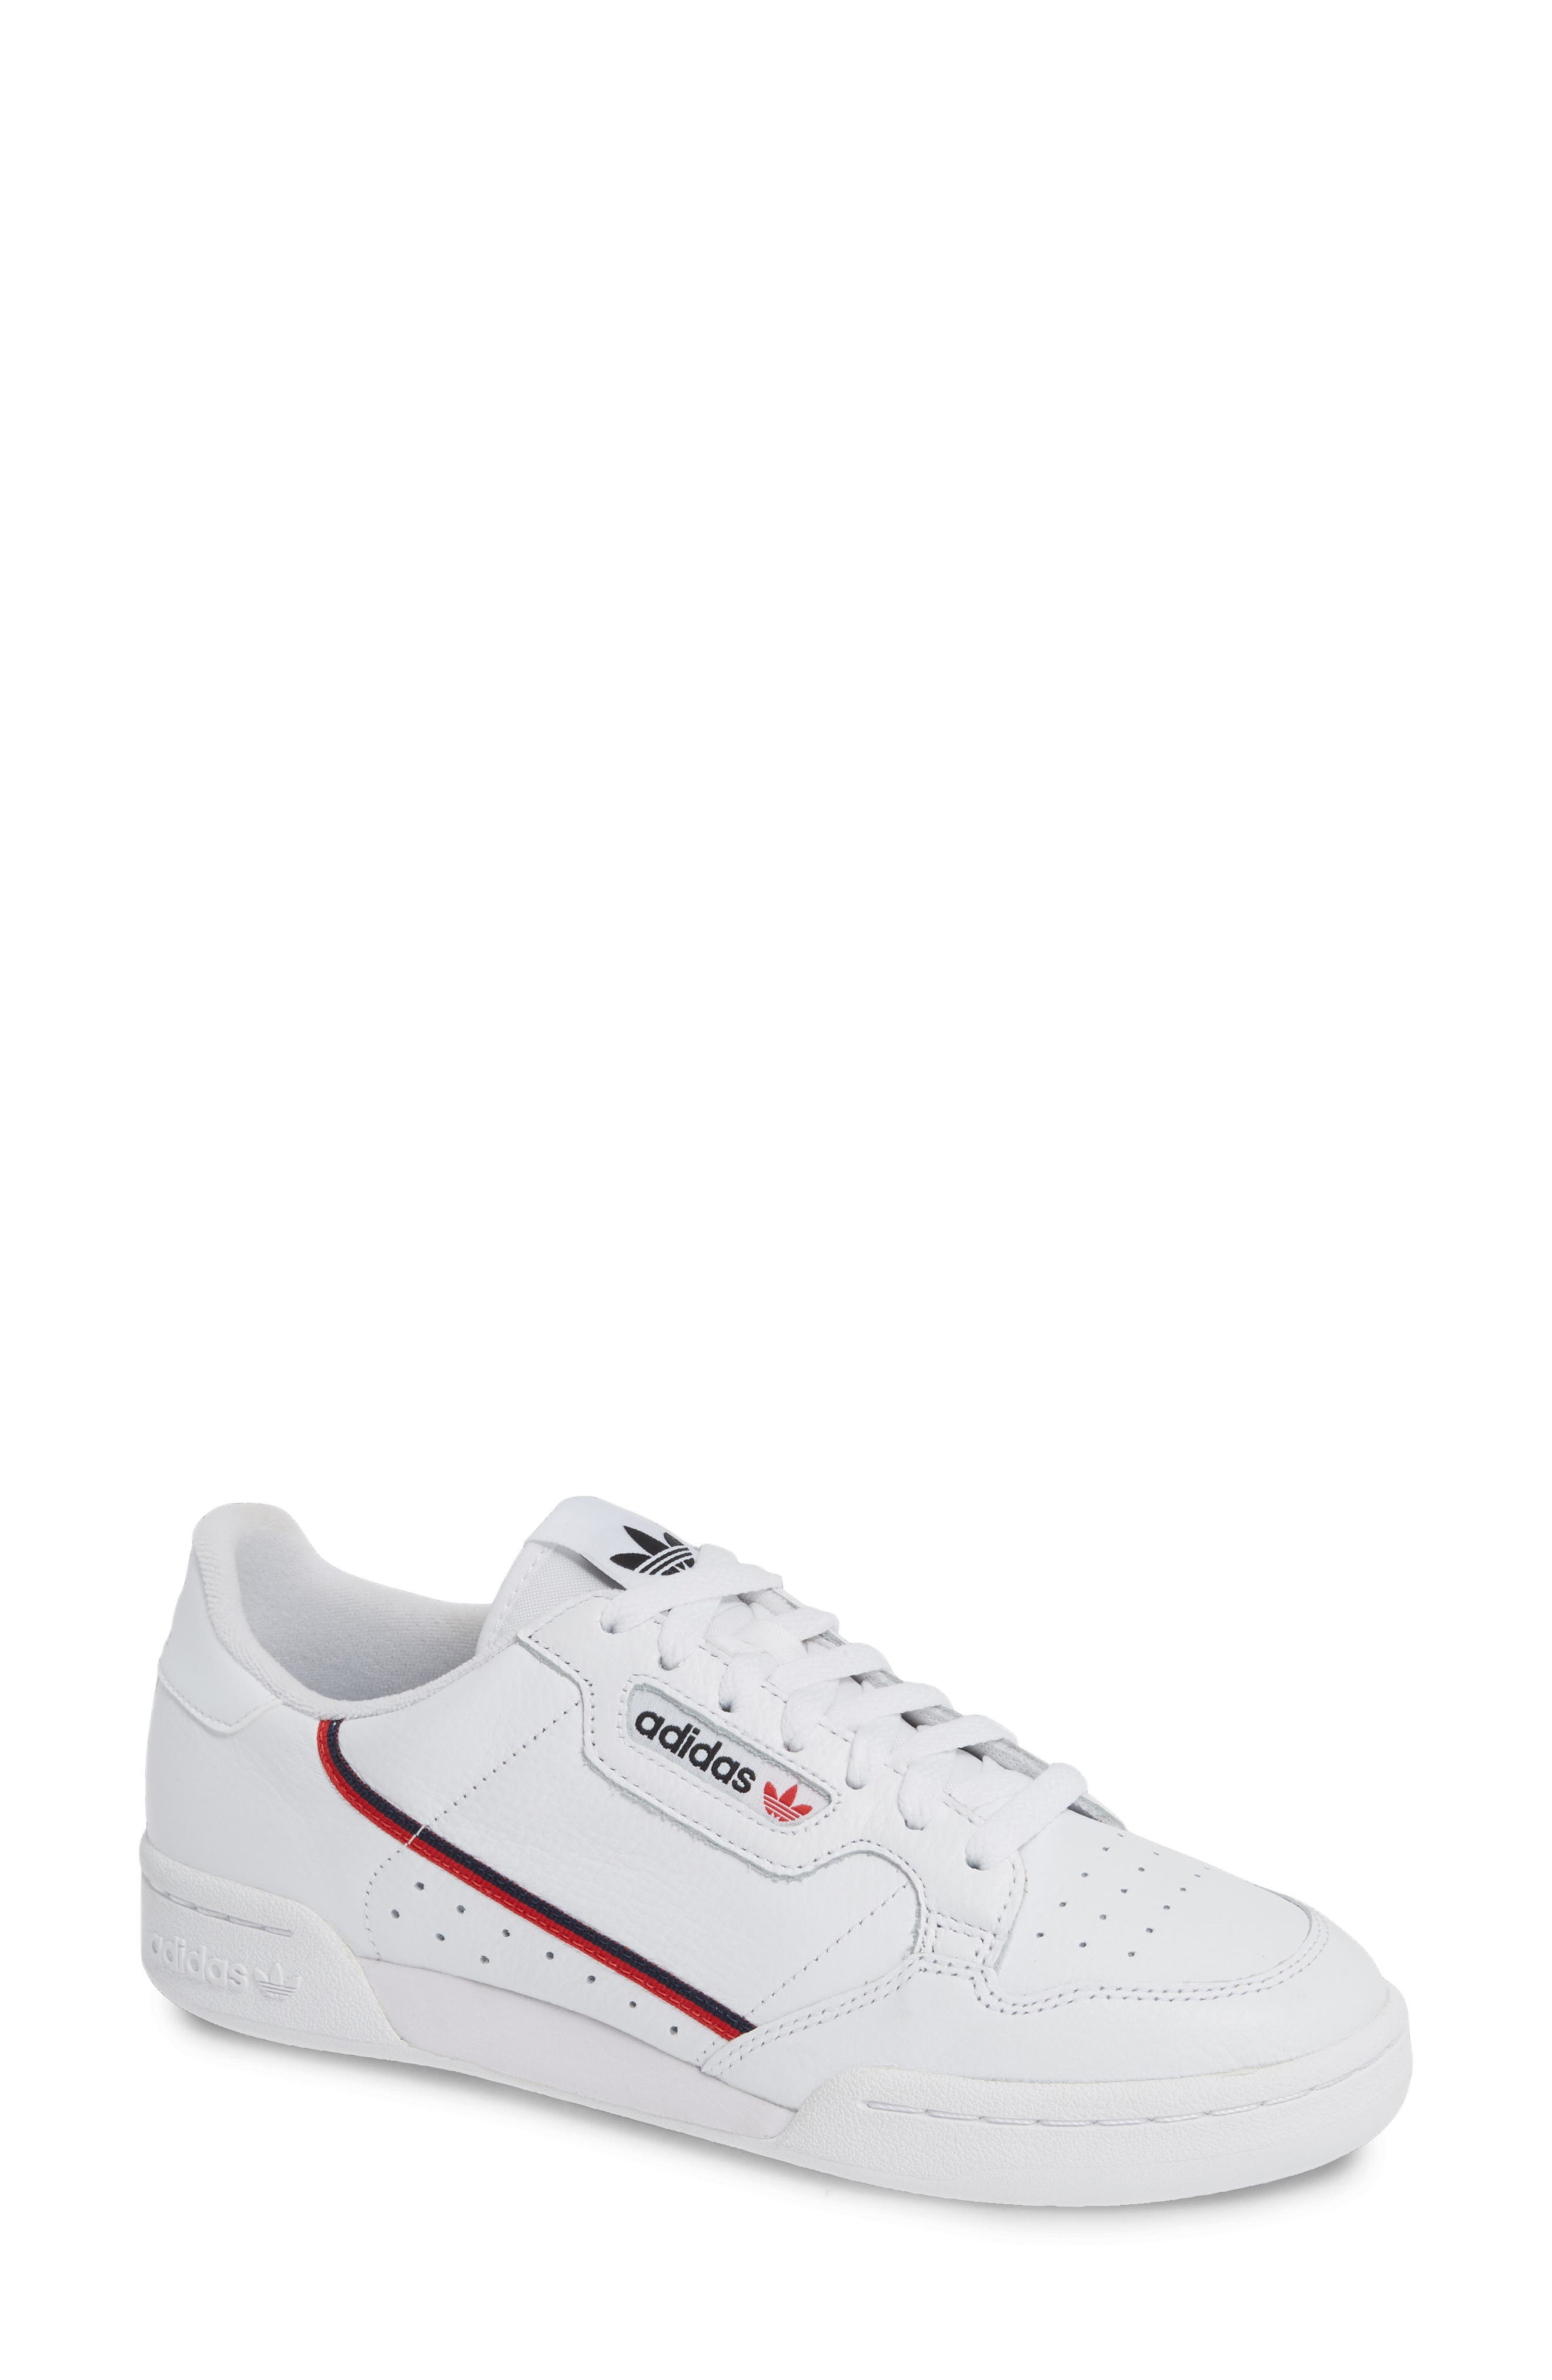 b8ae944a46b Women s Adidas Shoes